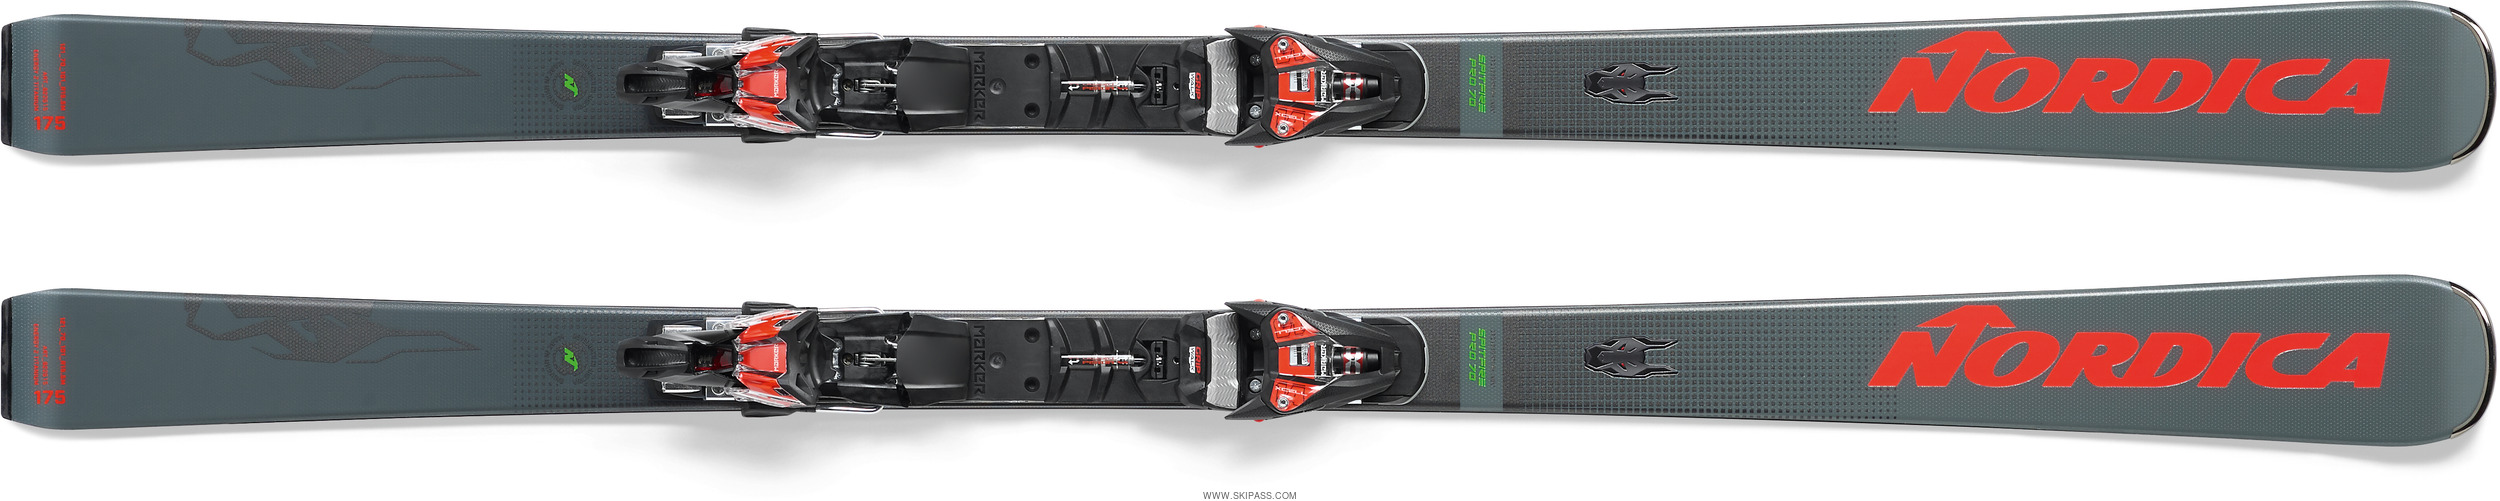 Nordica Dobermann Spitfire 70 Pro Piston